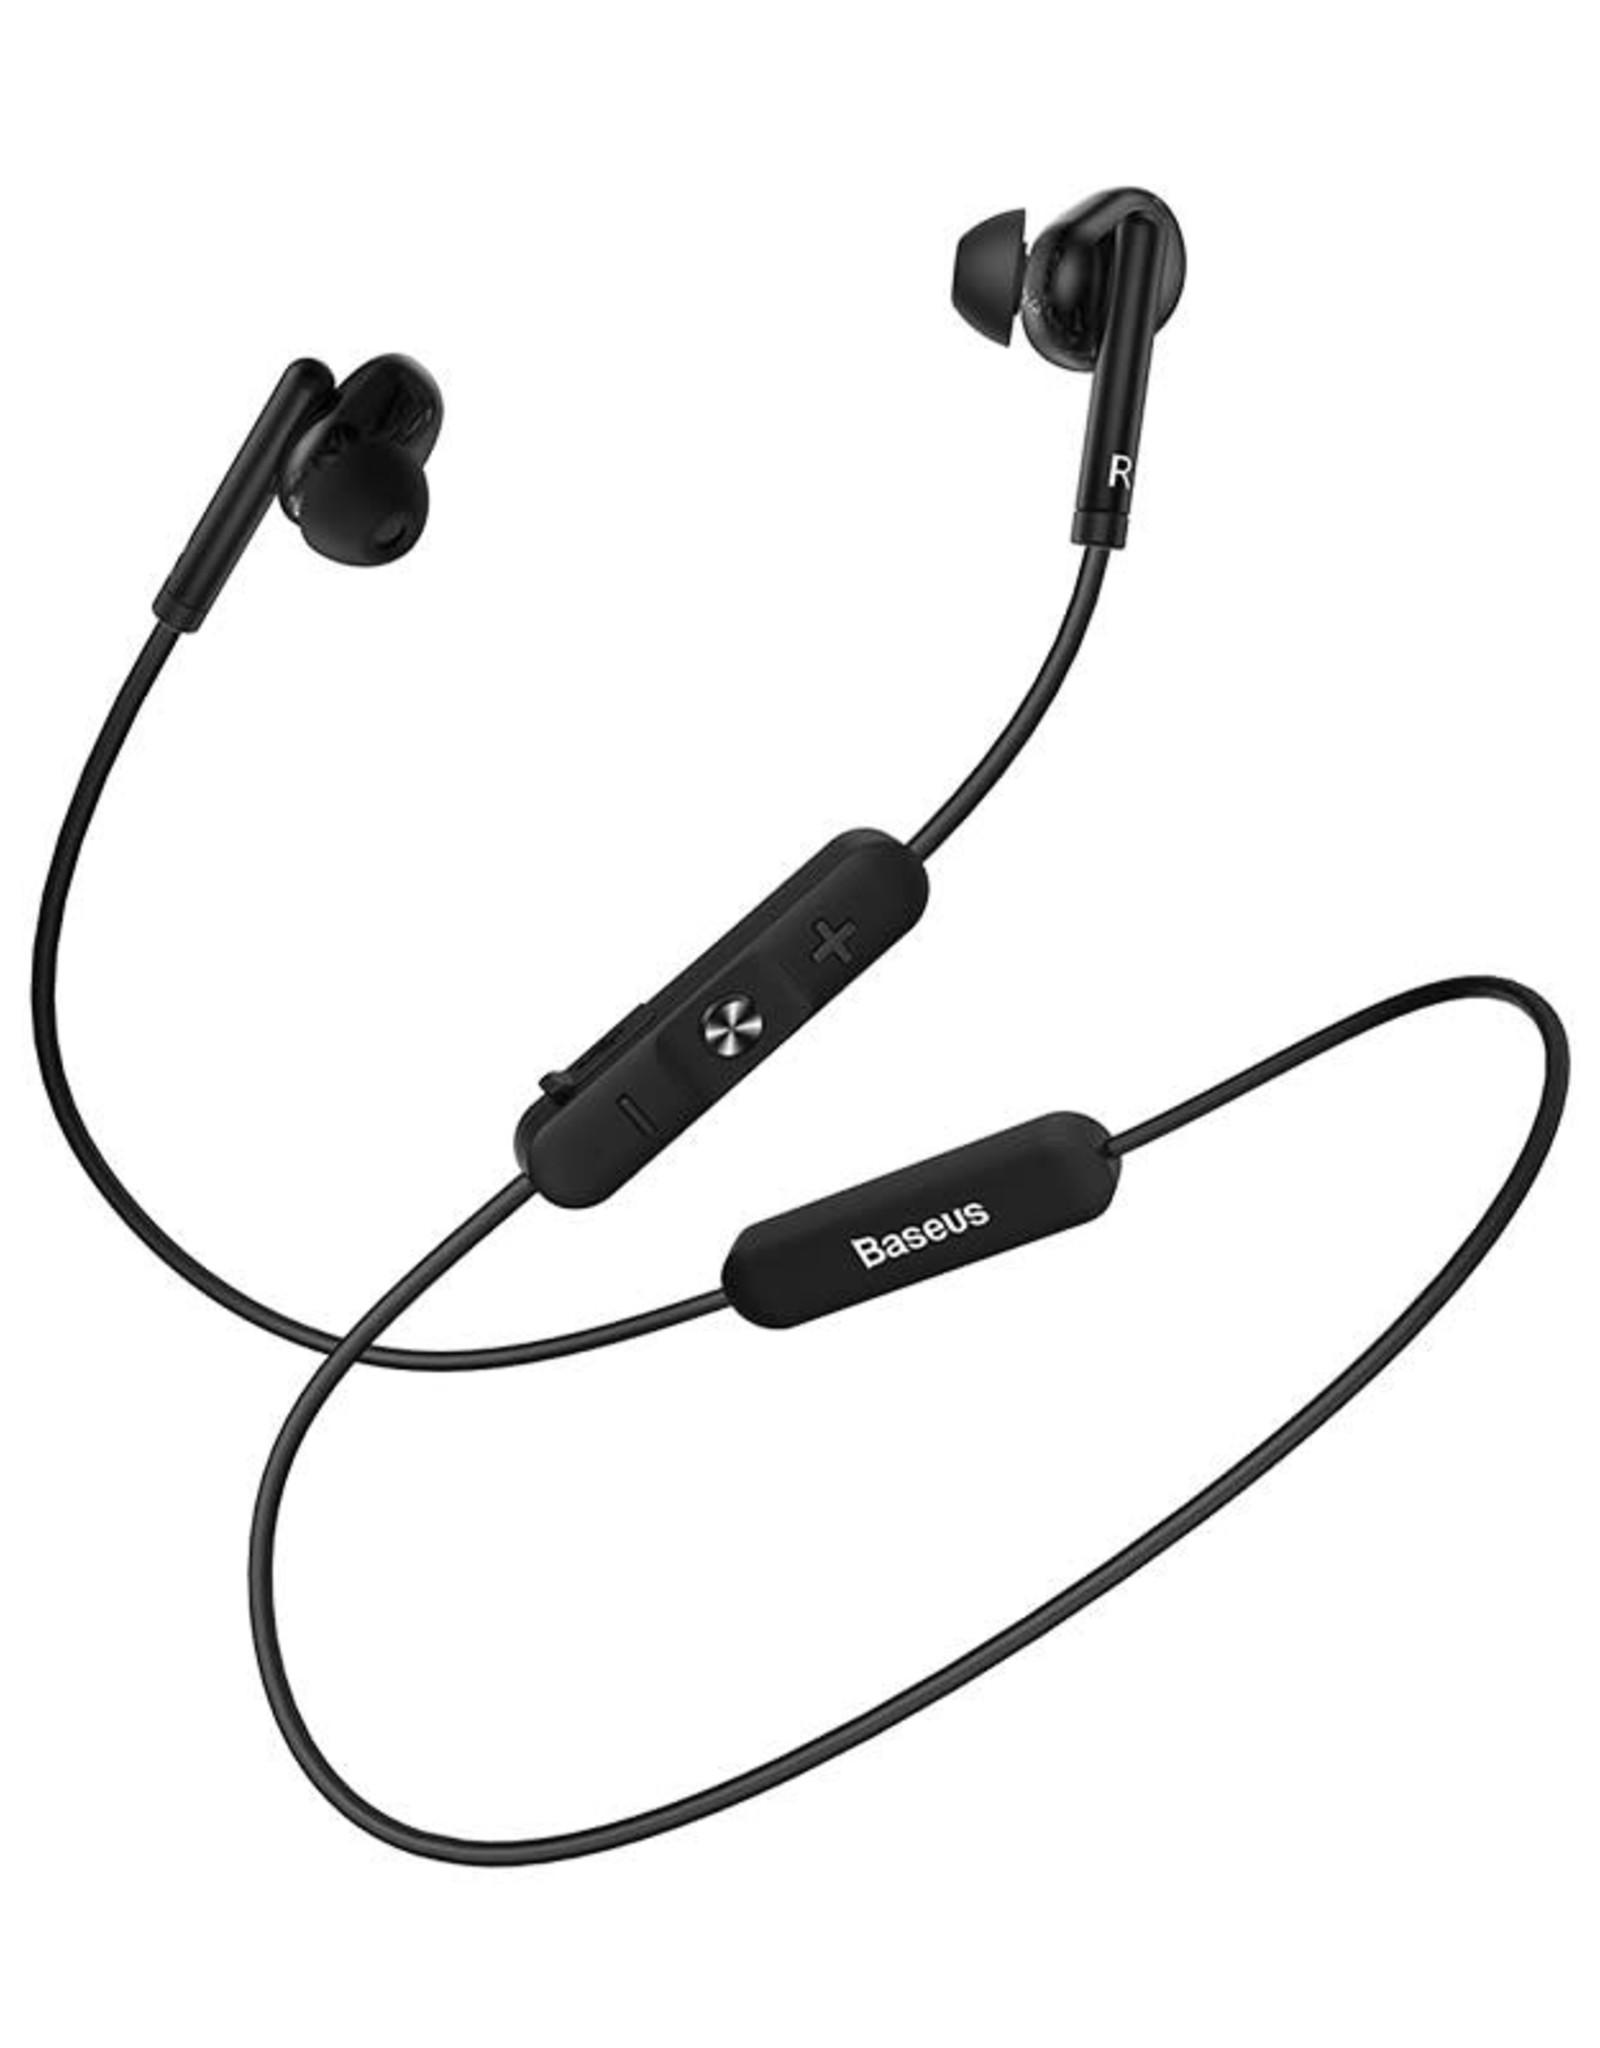 Baseus Encok S30 Bluetooth Sport earphones Black